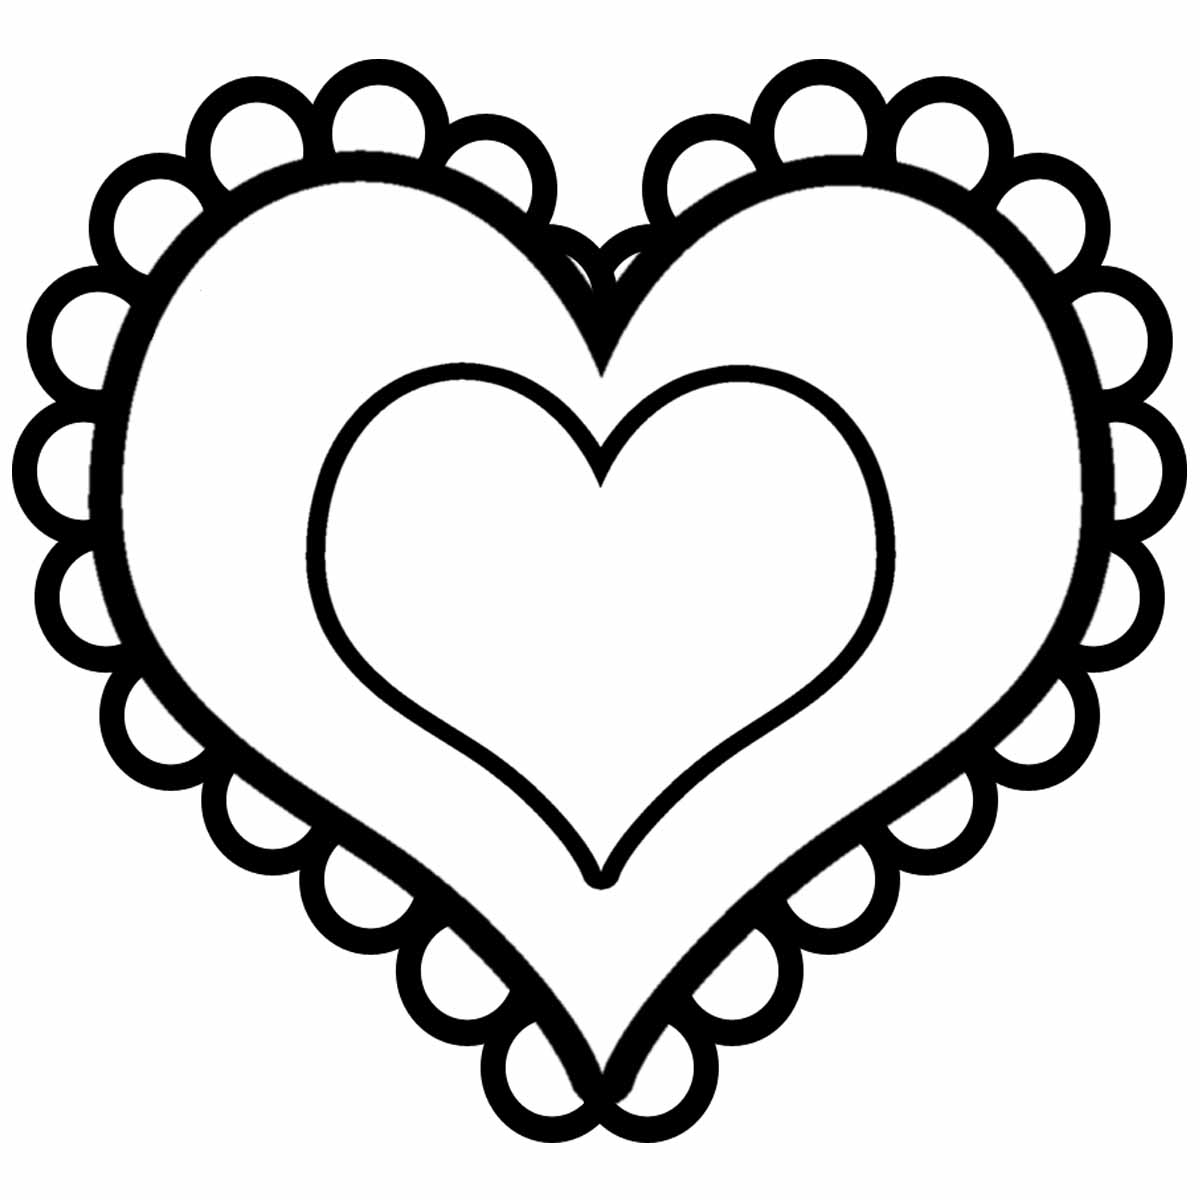 Heart-shaped clipart printable #3